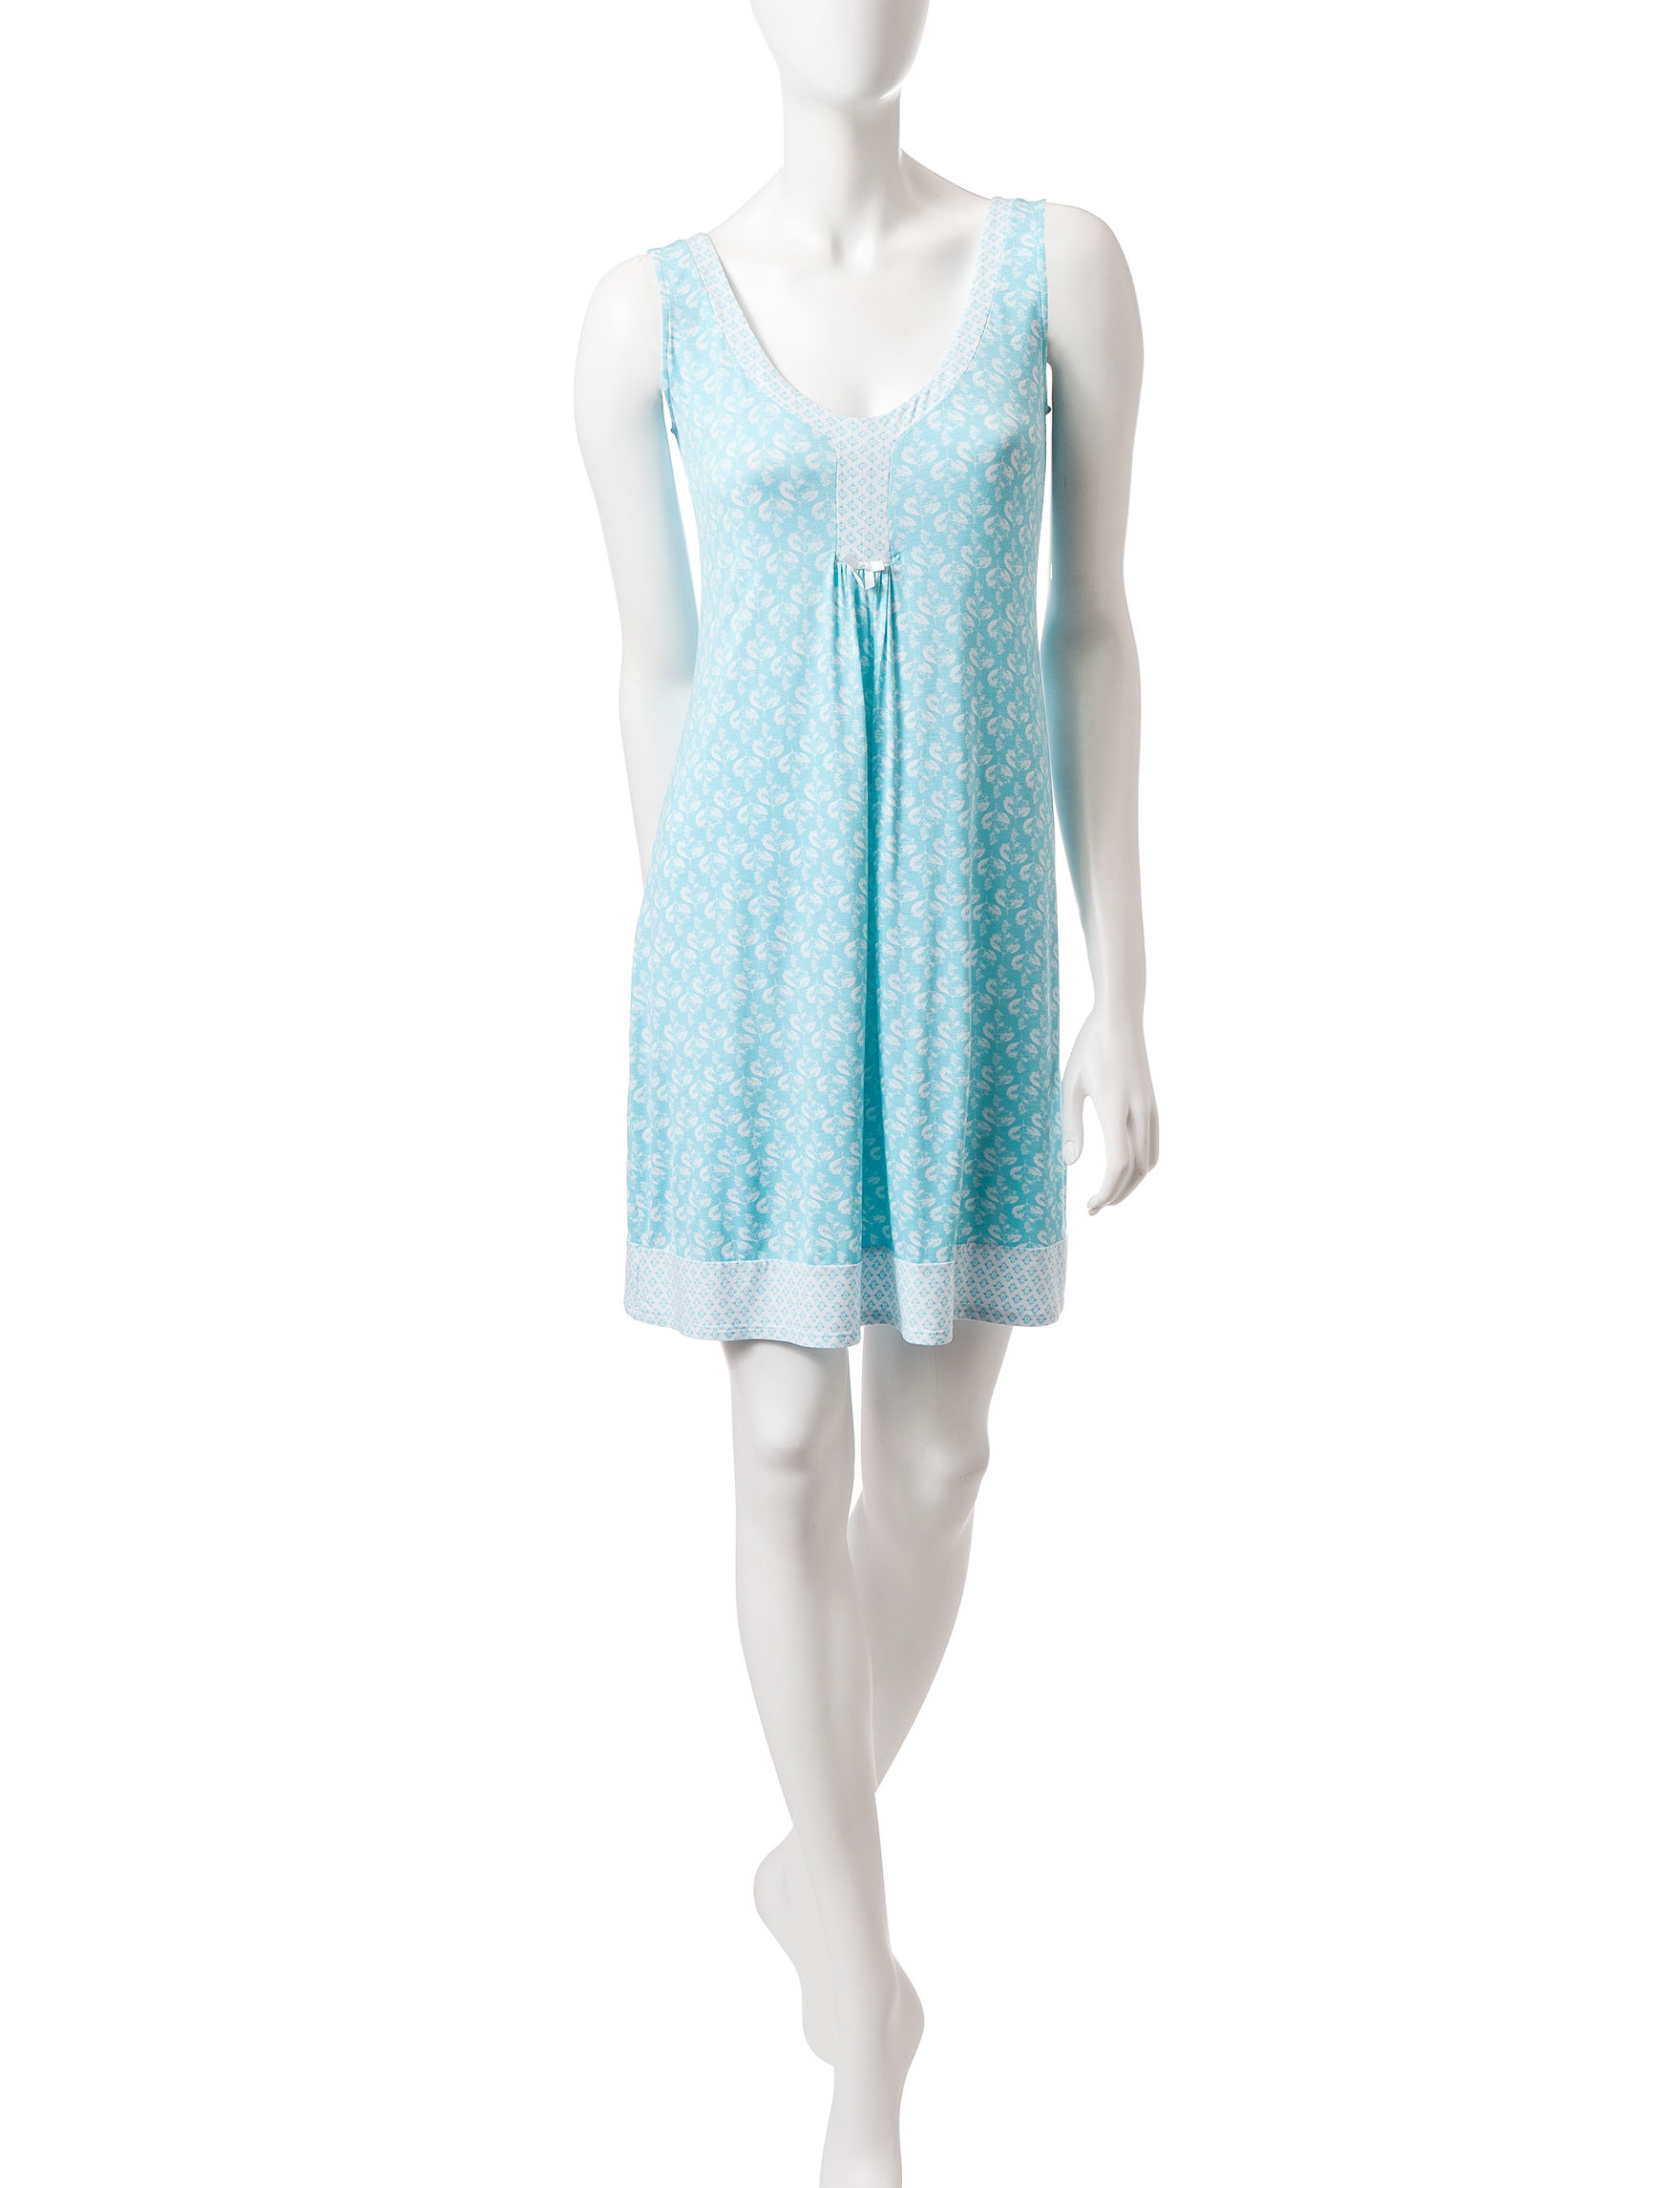 Laura Ashley Blue / White Nightgowns & Sleep Shirts